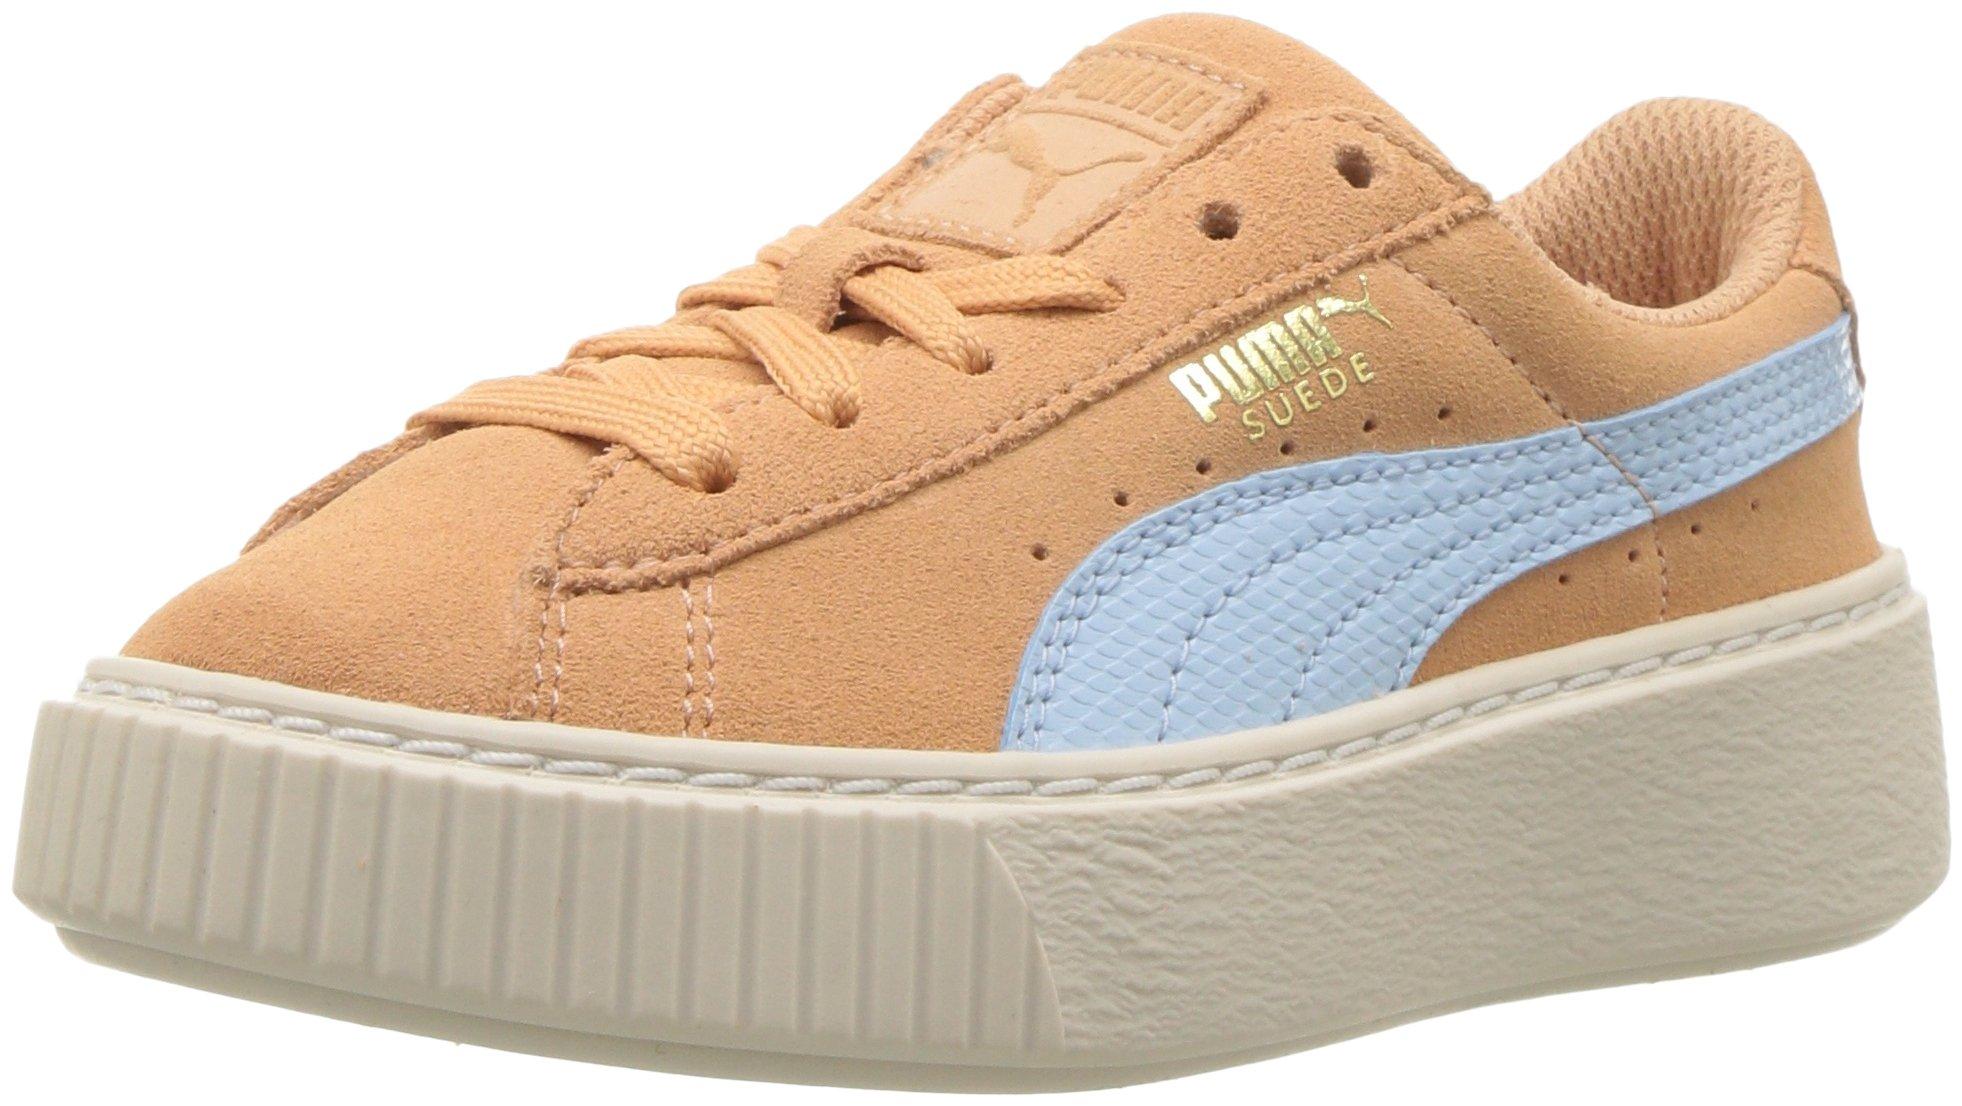 PUMA Unisex-Kids Suede Platform SNK Kids Sneaker, Dusty Coral-Cerulean Team Gold, 4 M US Big Kid